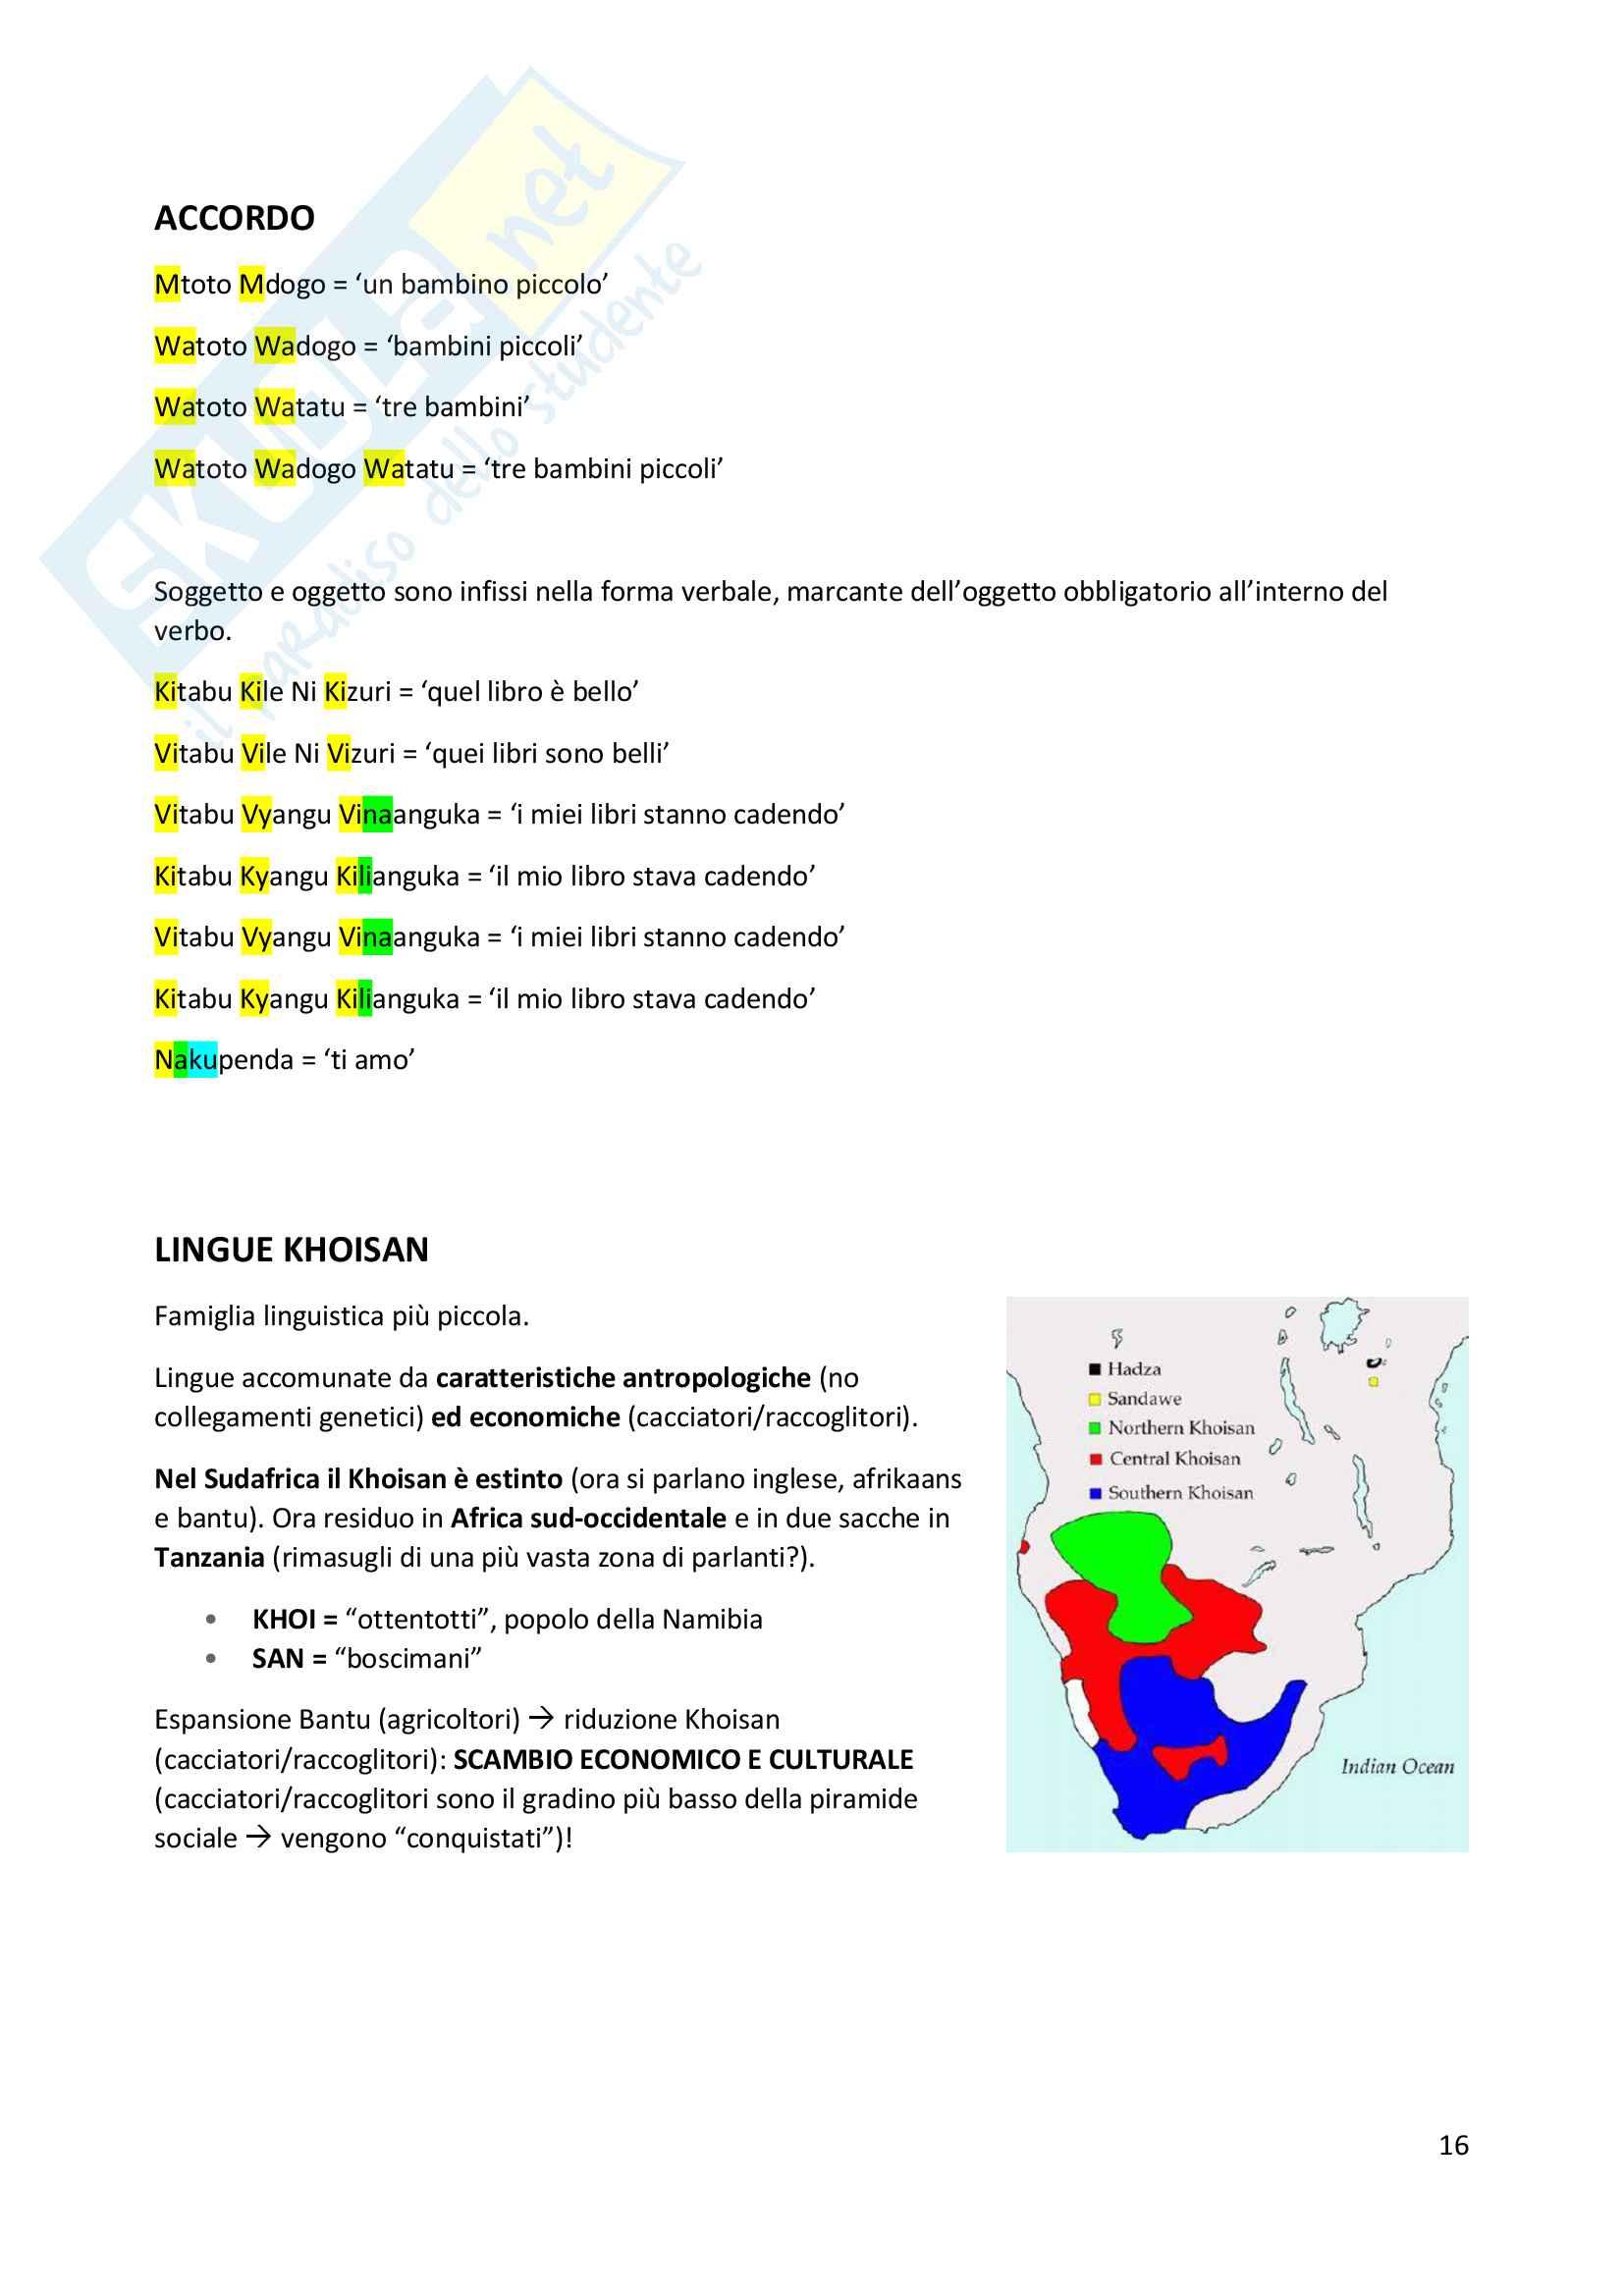 Appunti completi di Linguistica Africana 2016/2017 Pag. 16